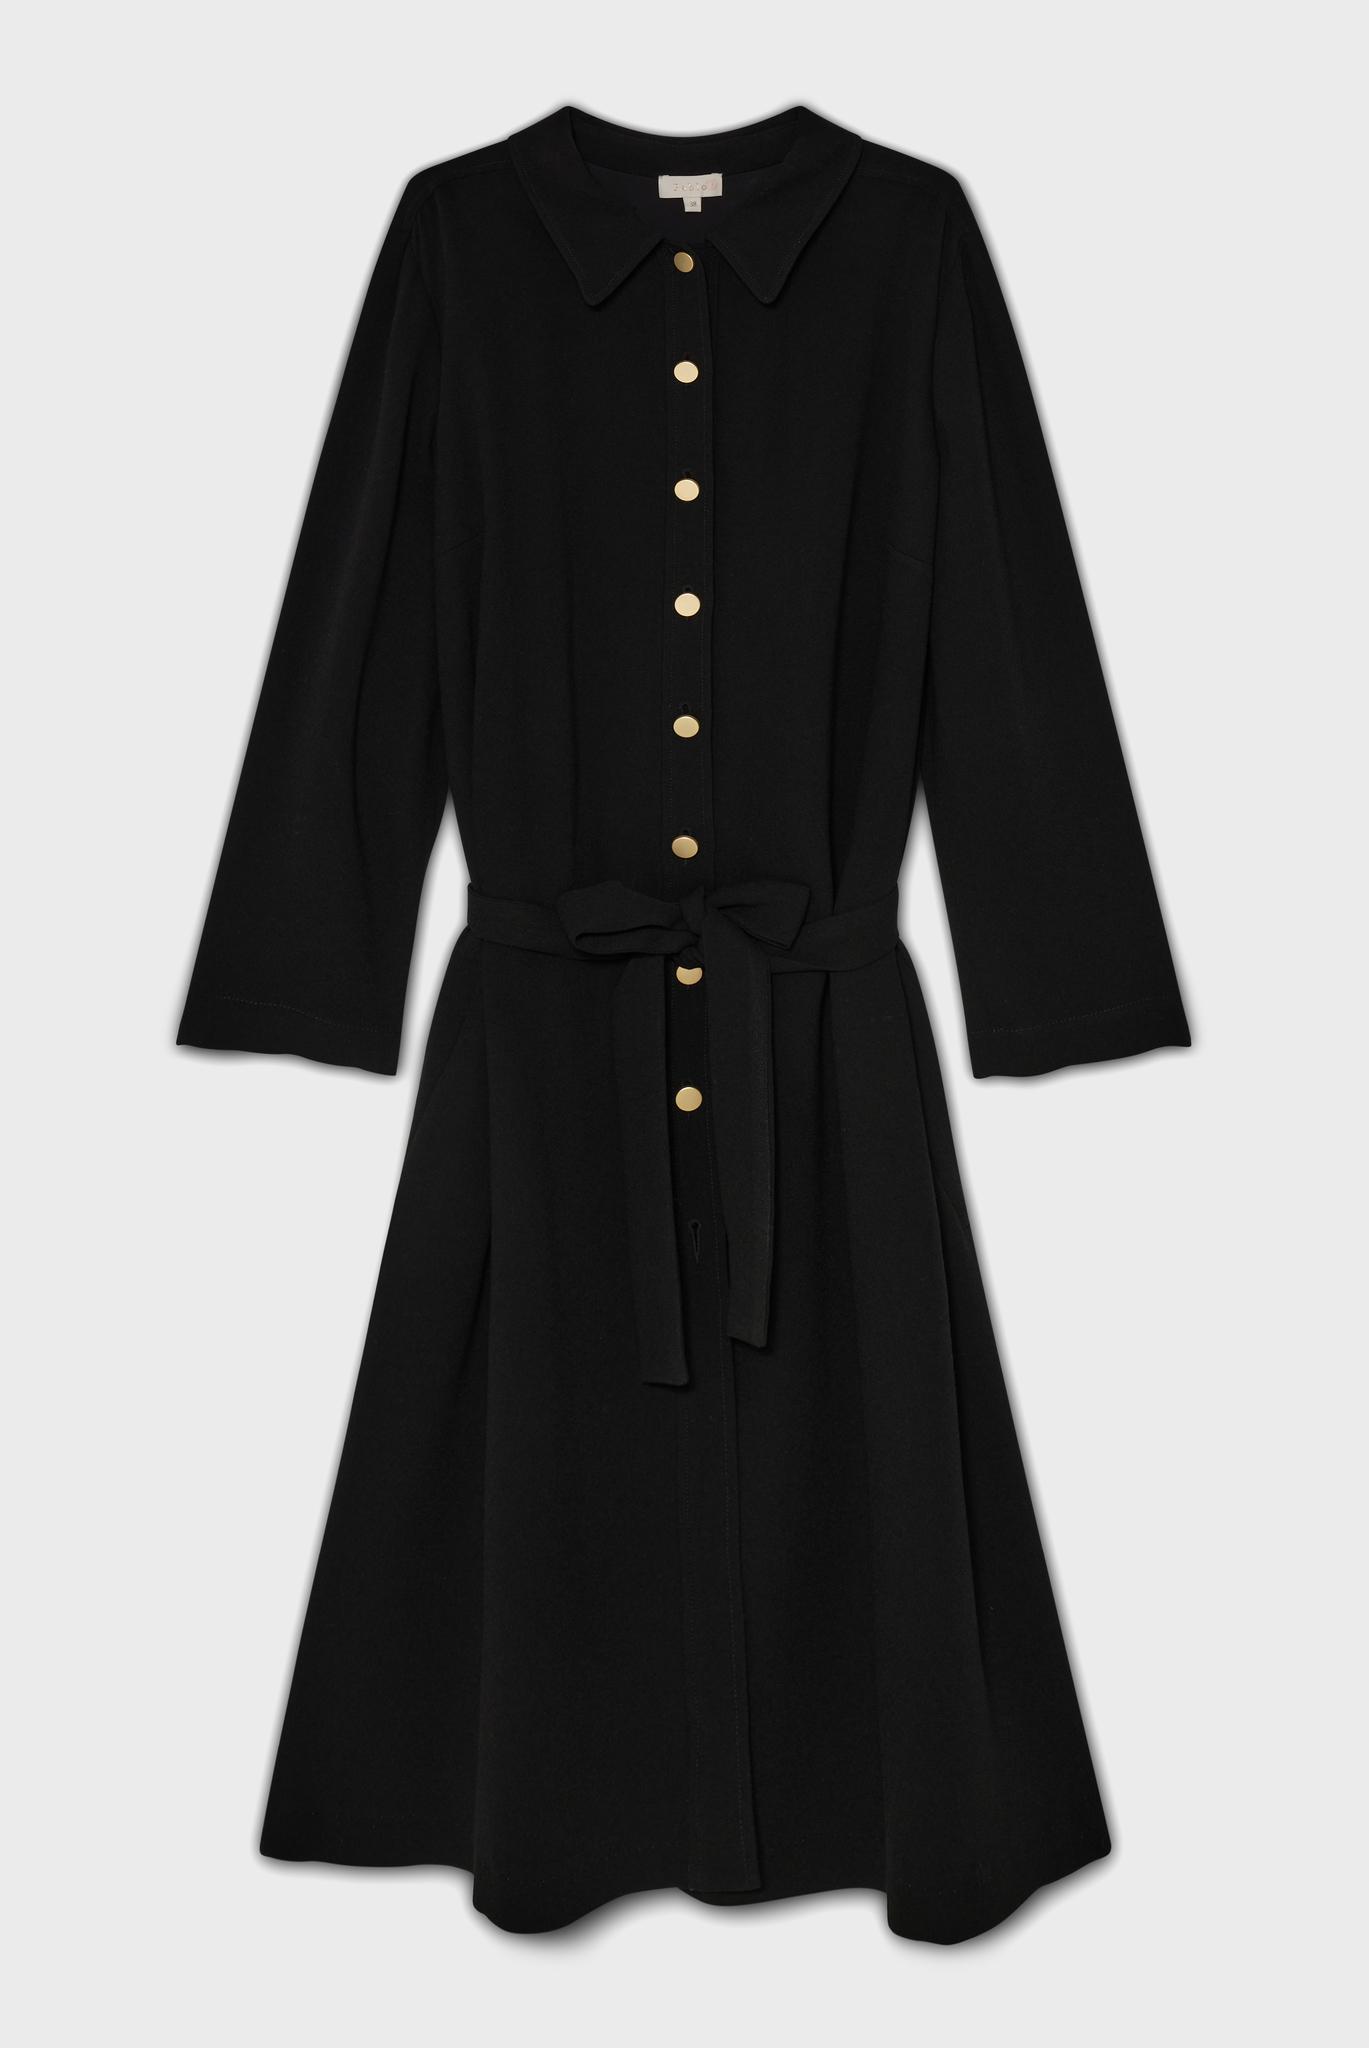 RUBEN - Платье-рубашка с поясом